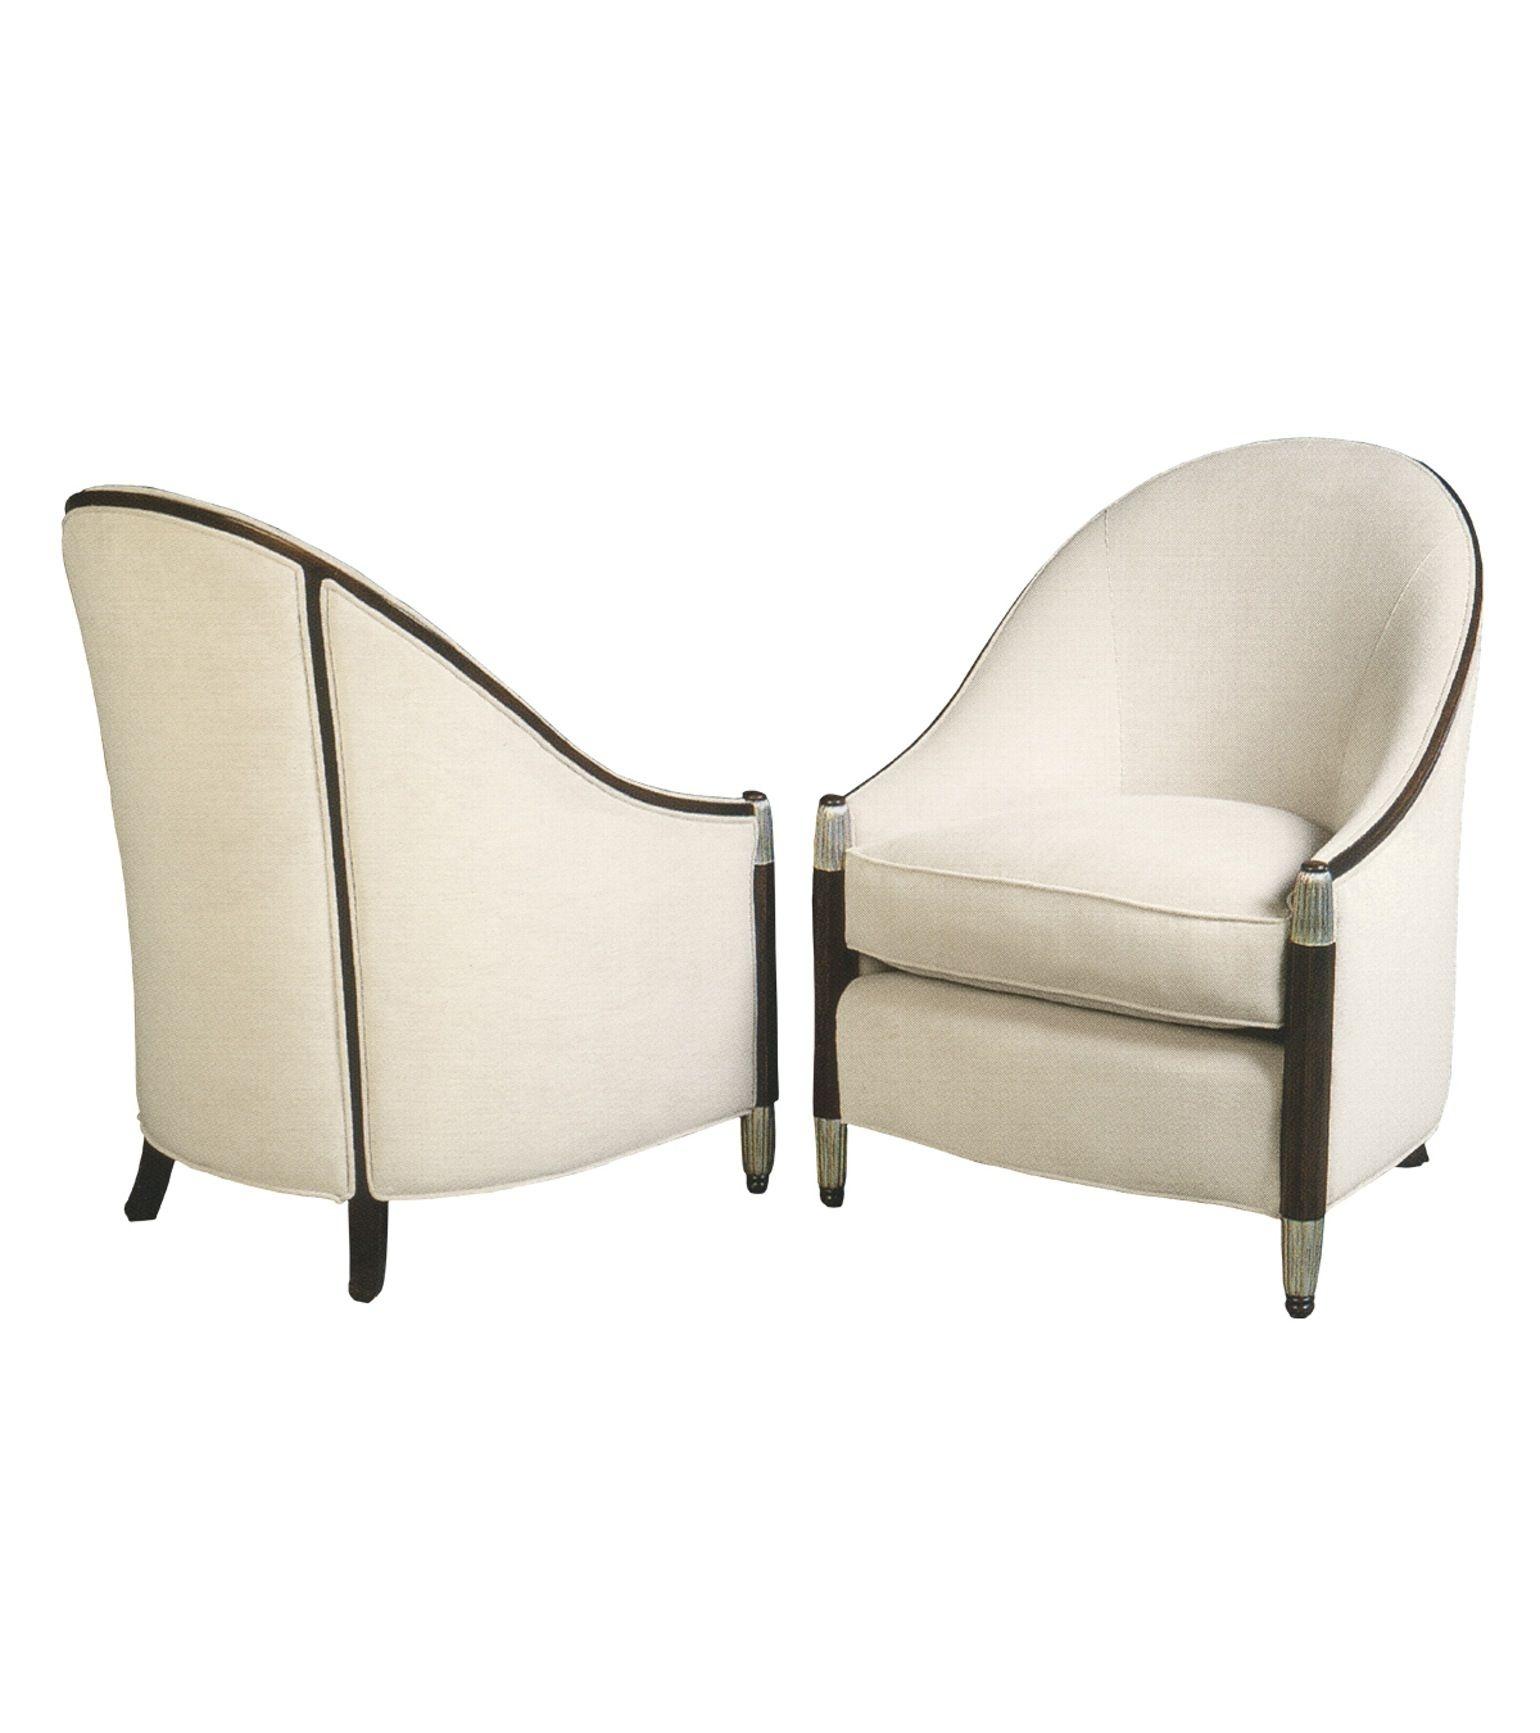 Good Art Deco Lounge Chair